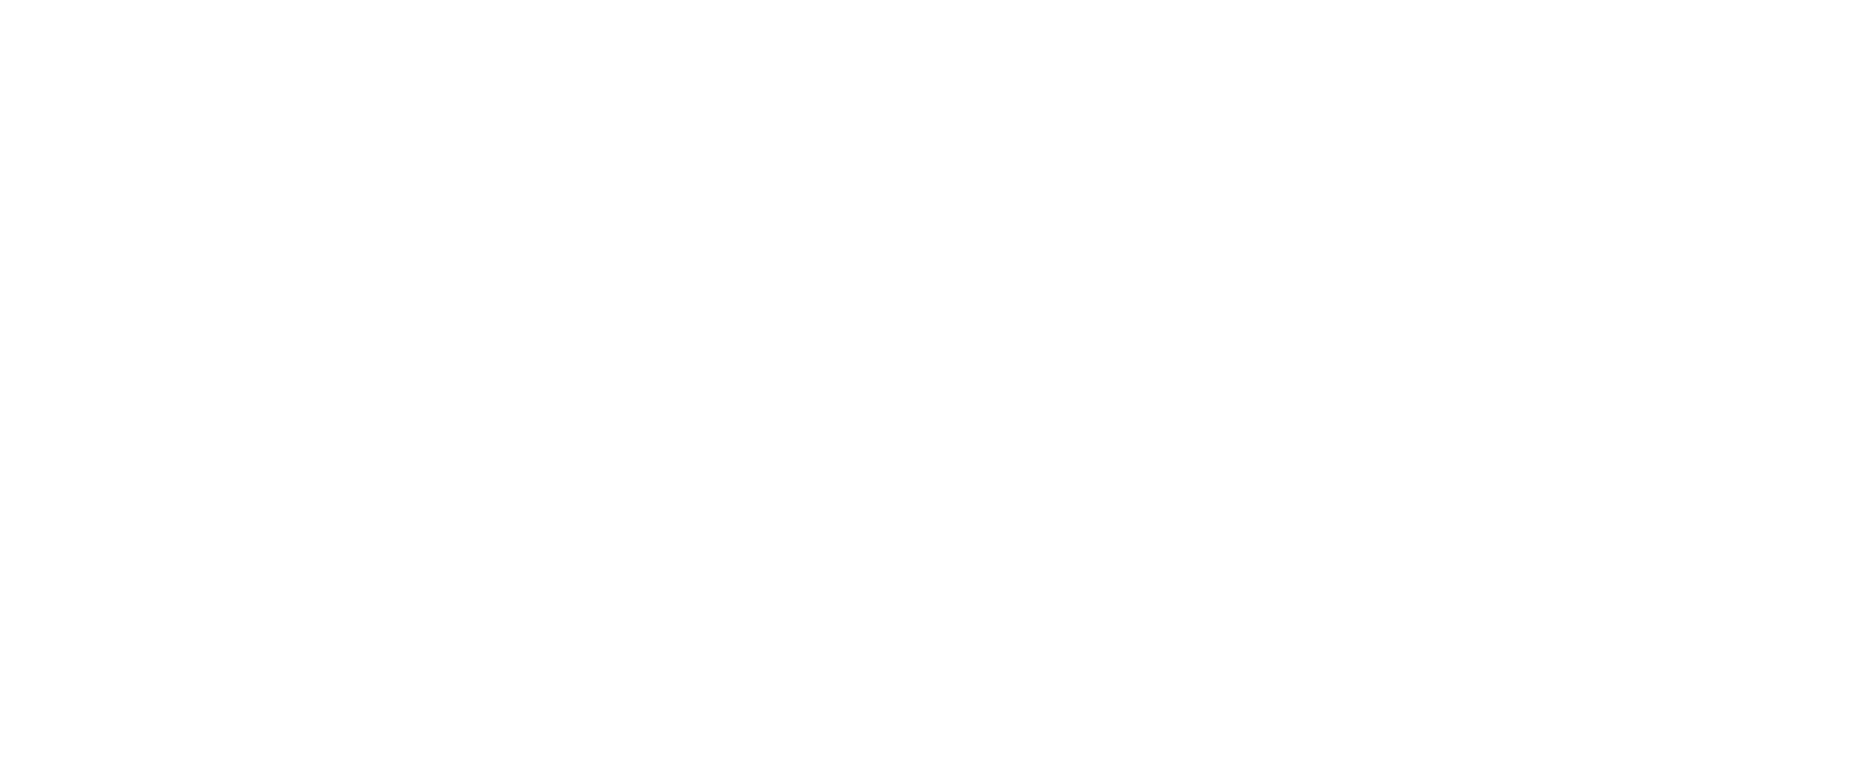 Hvv Karte Verloren.Faq Zum Semesterticket Asta Universität Lüneburg